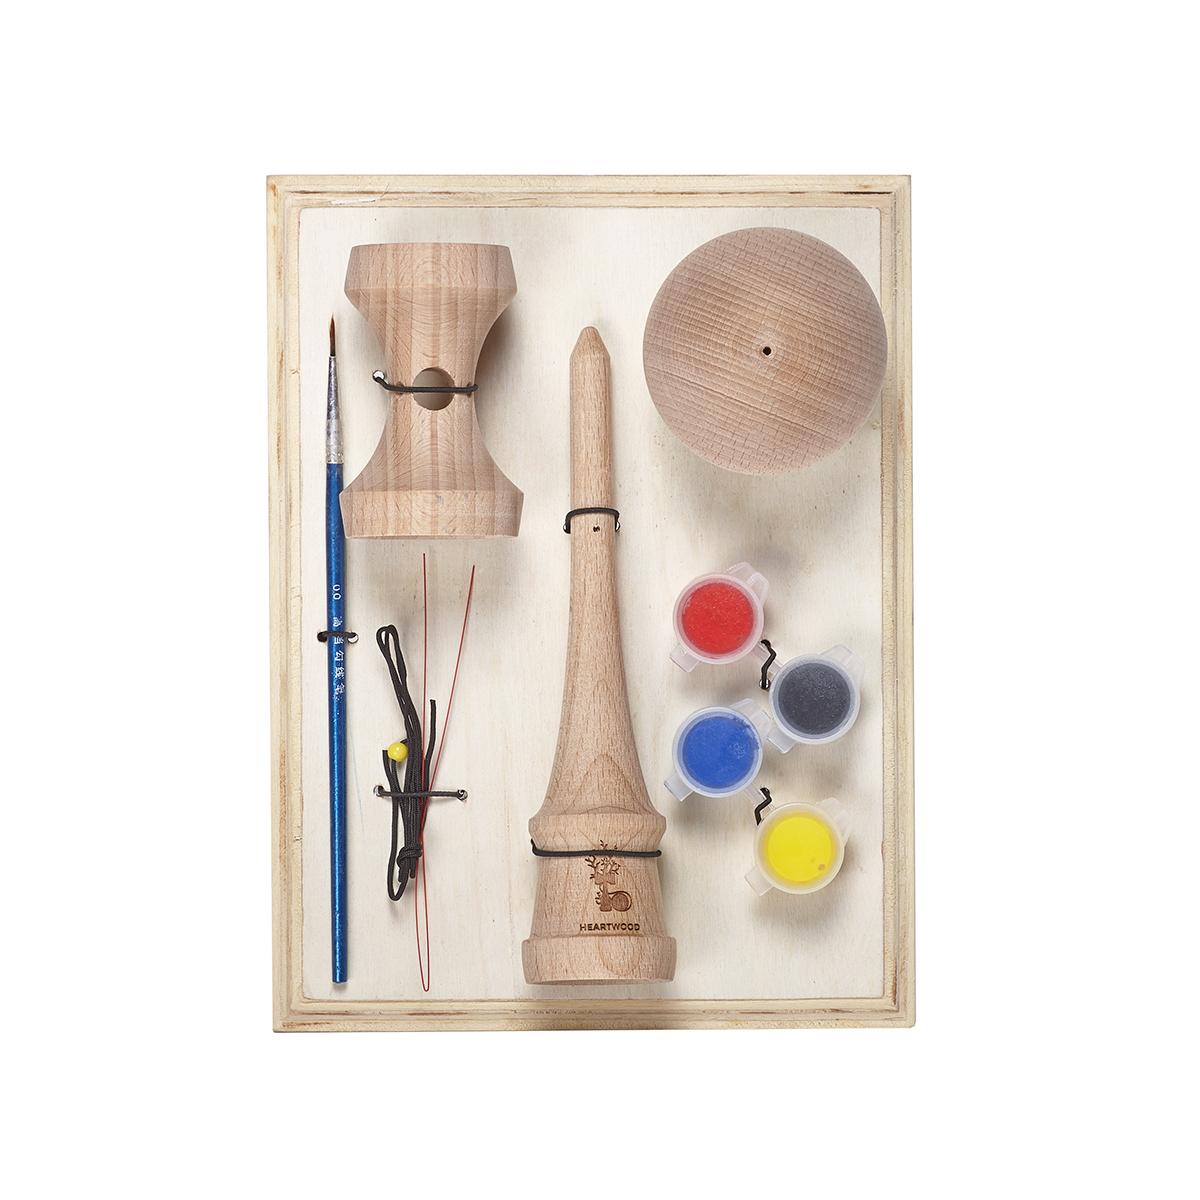 Heartwood Kendama DIY kit